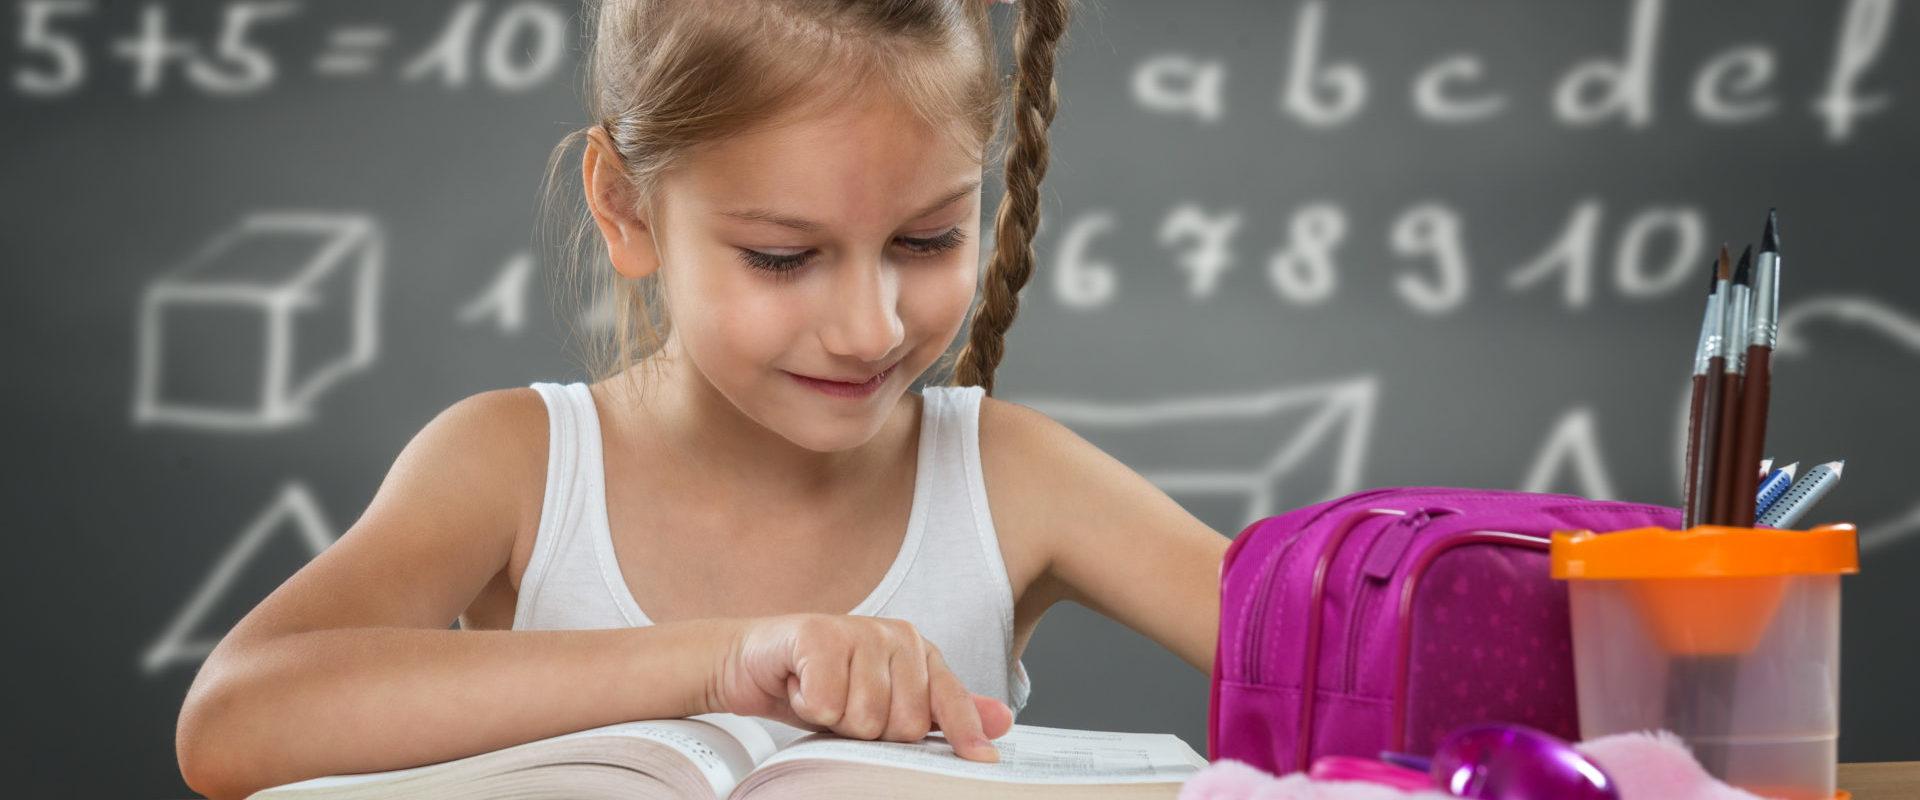 Little girl reading in school, written job behind the plate